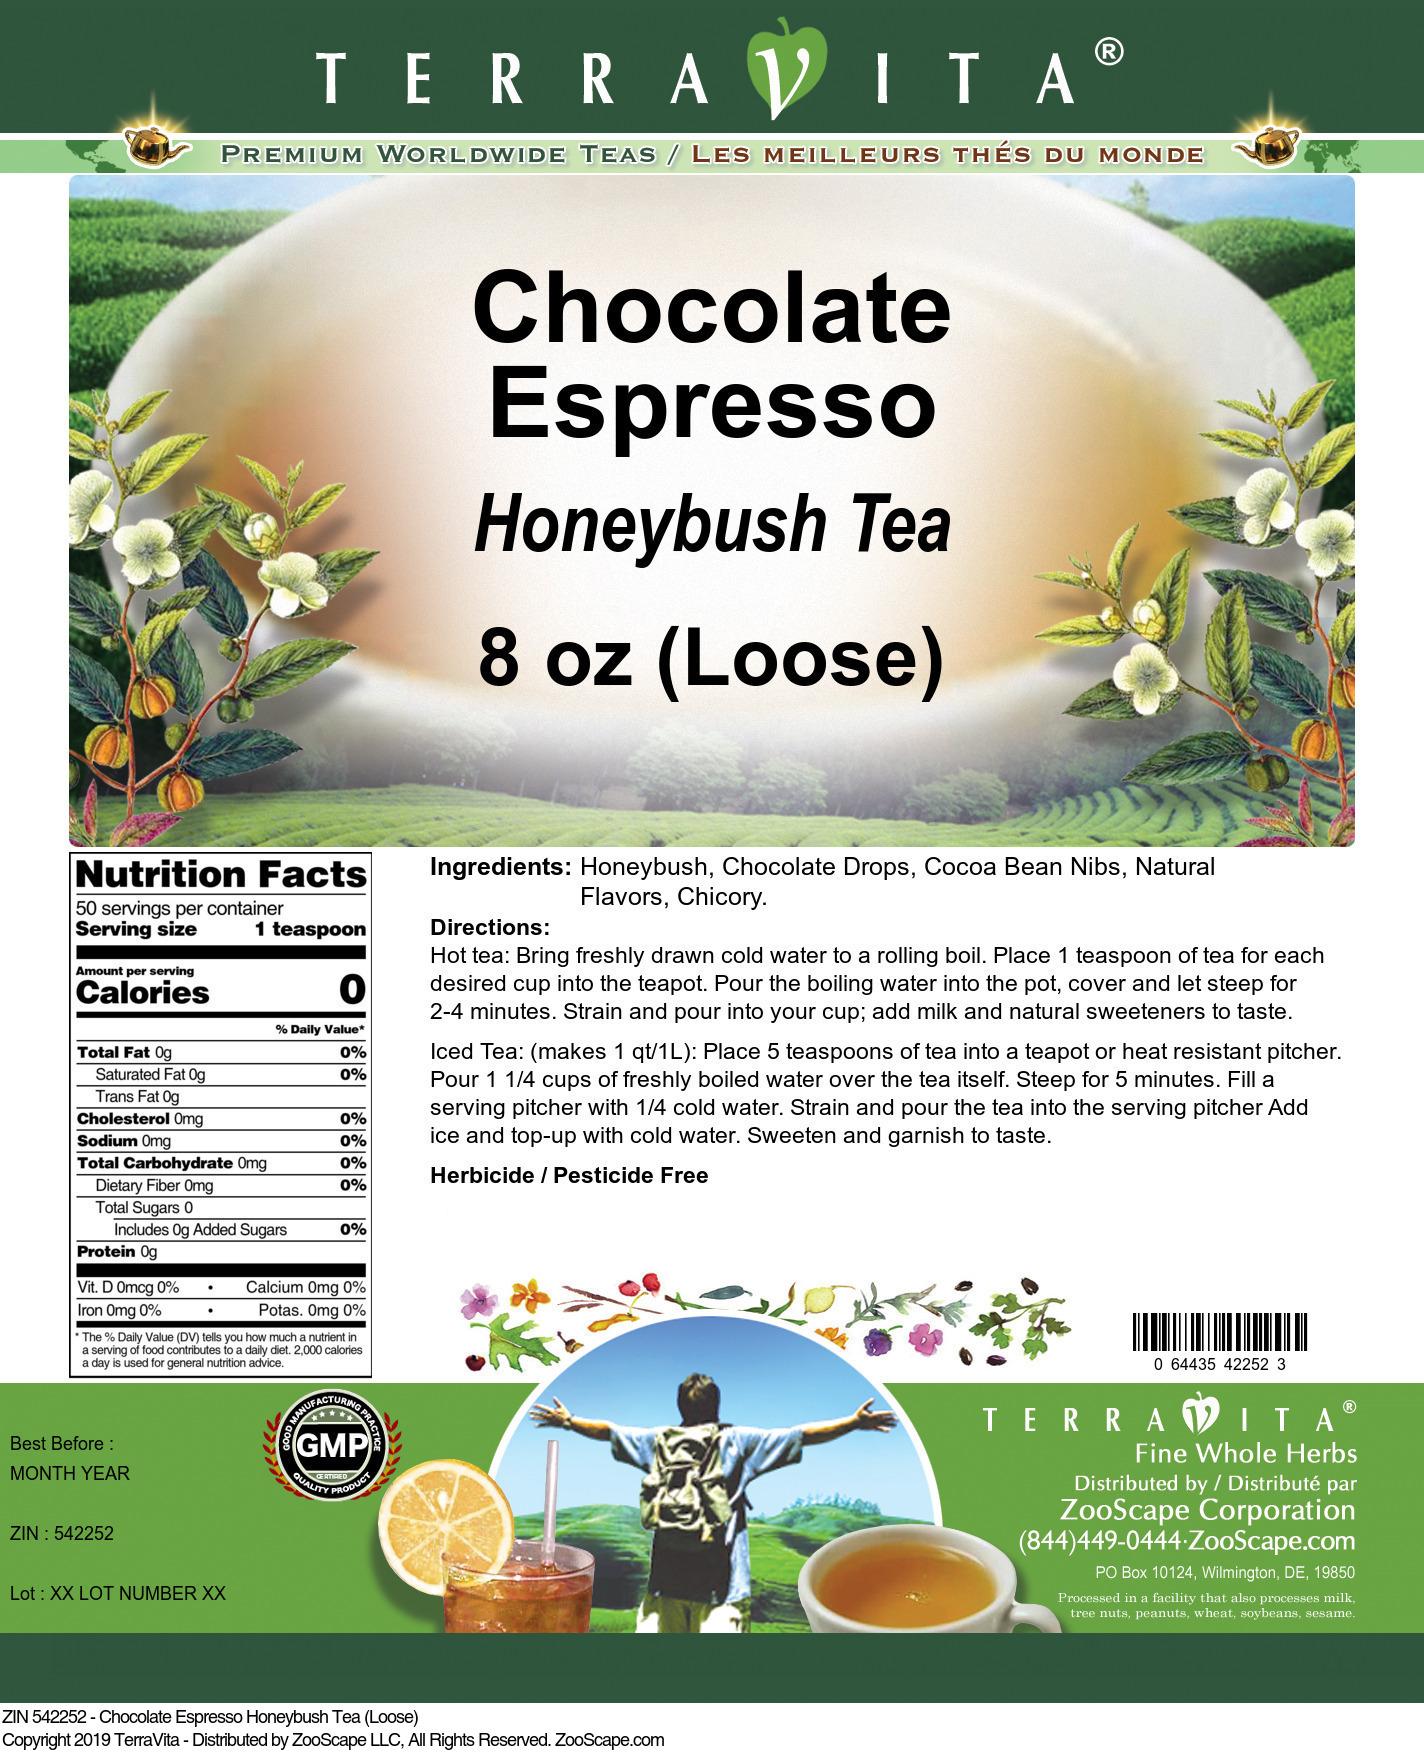 Chocolate Espresso Honeybush Tea (Loose)